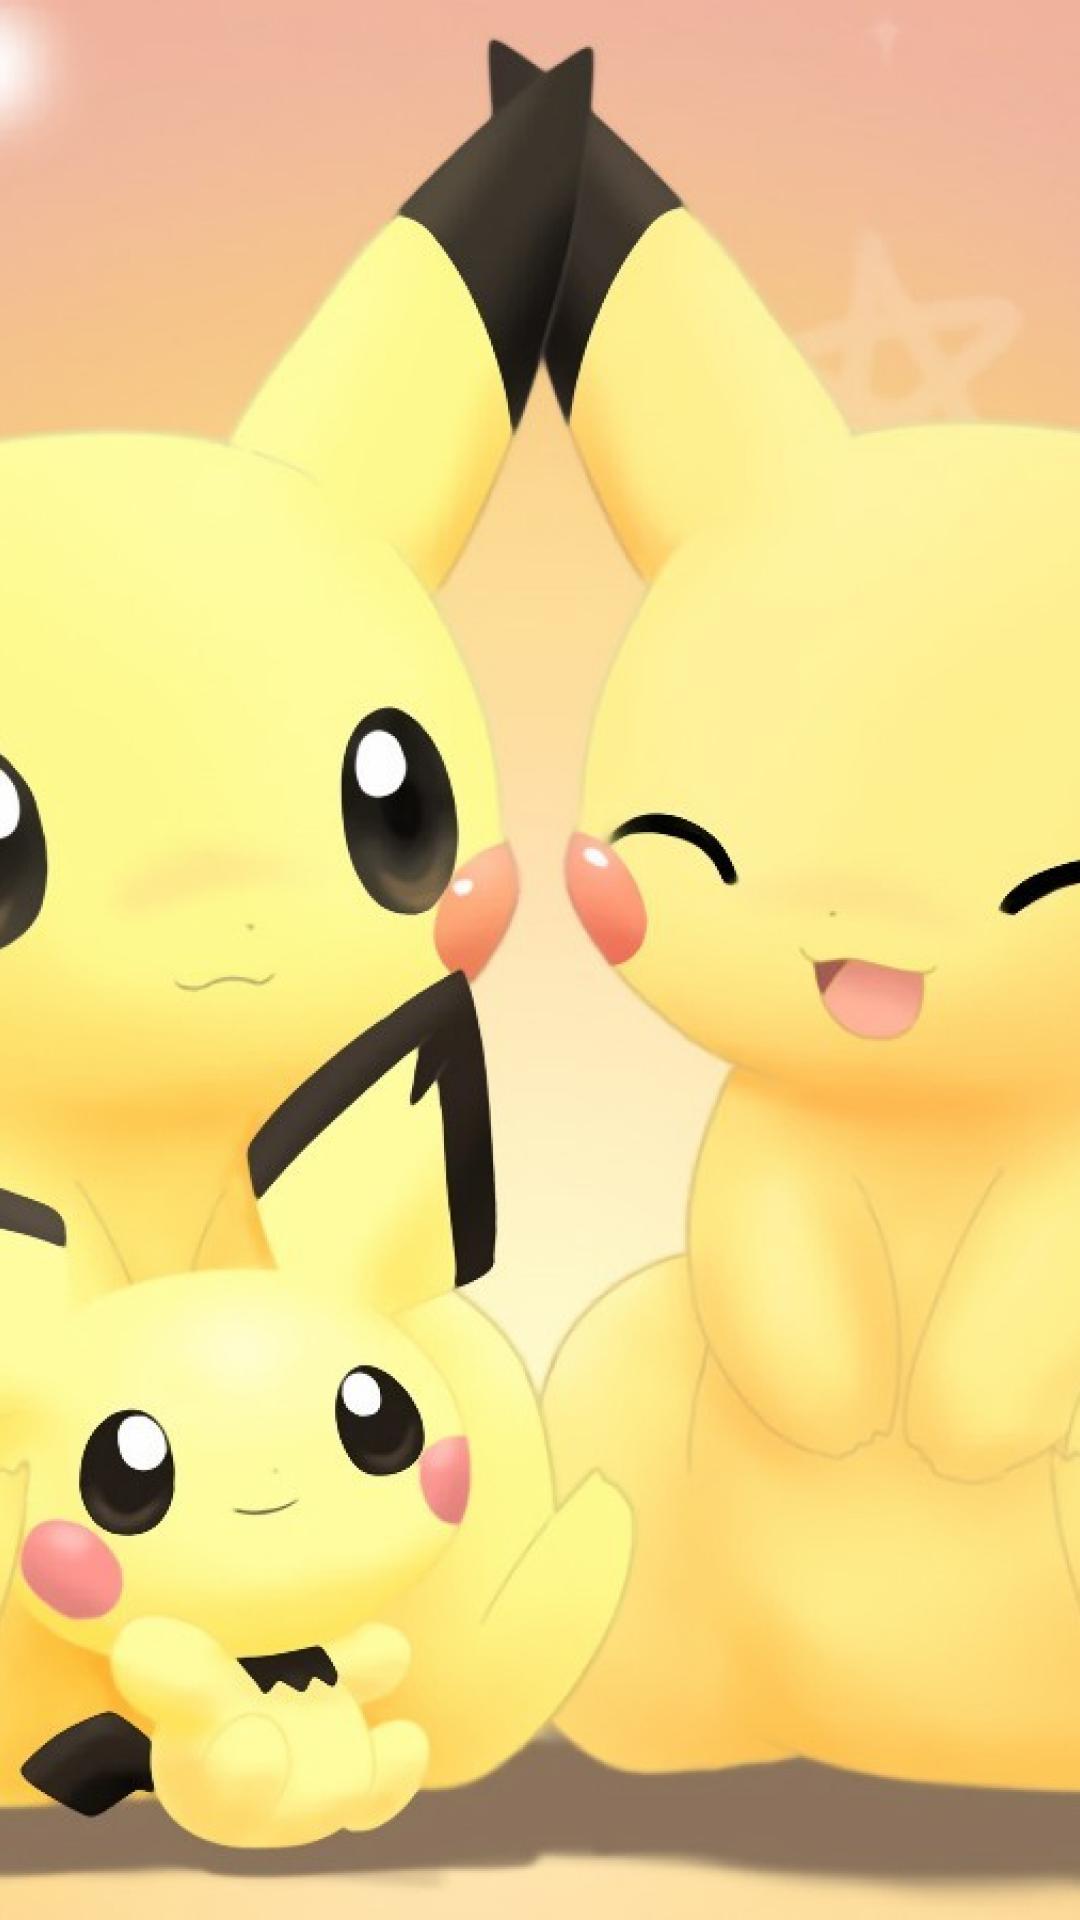 Cute Girly Wallpapers For Iphone 6 Plus Pokemon Iphone Wallpaper Pixelstalk Net